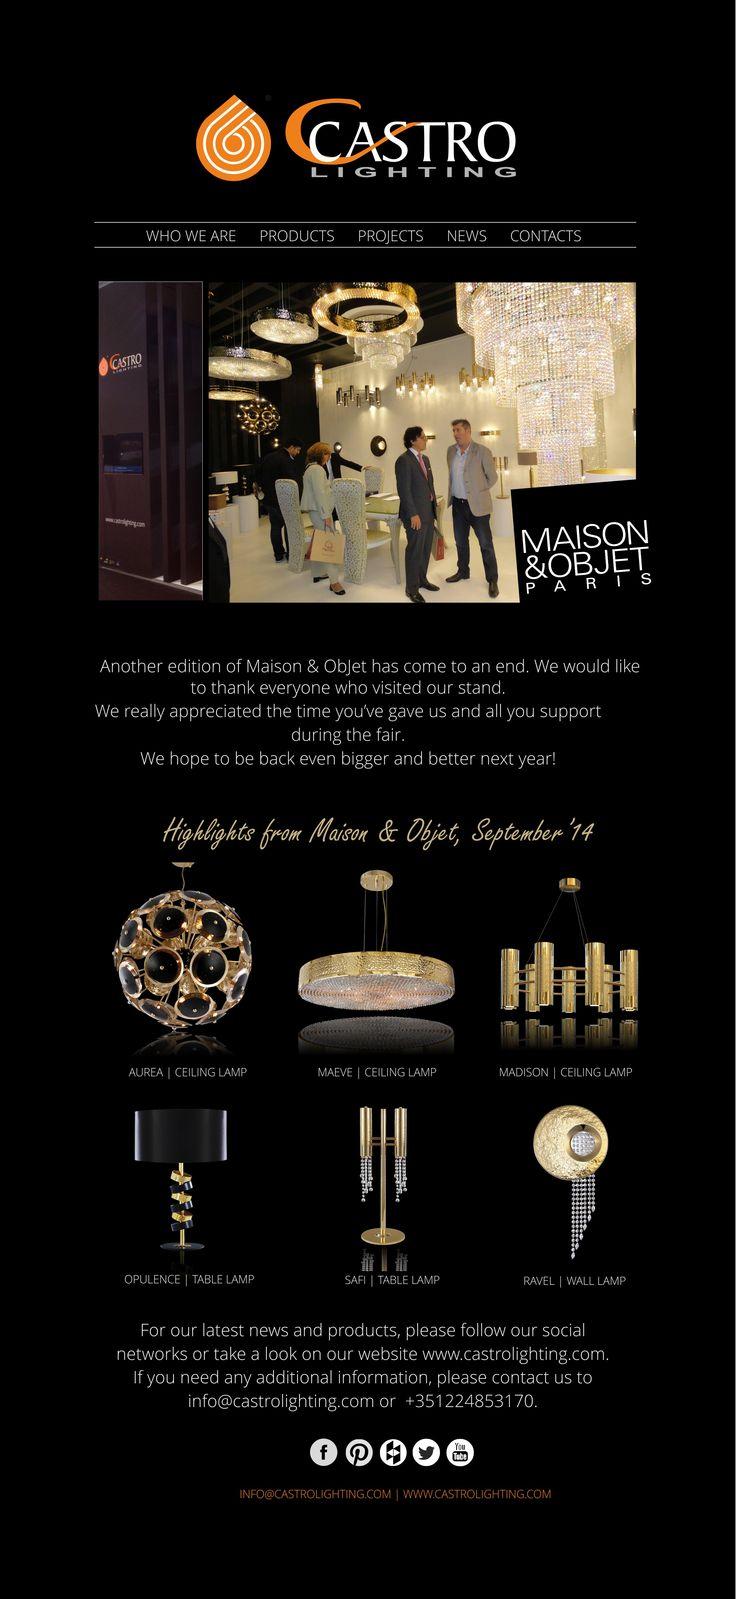 Highlights from Maison & Objet, September 2014  Subscribe to our newsletter: http://castrolighting.com/en/newsletter.php